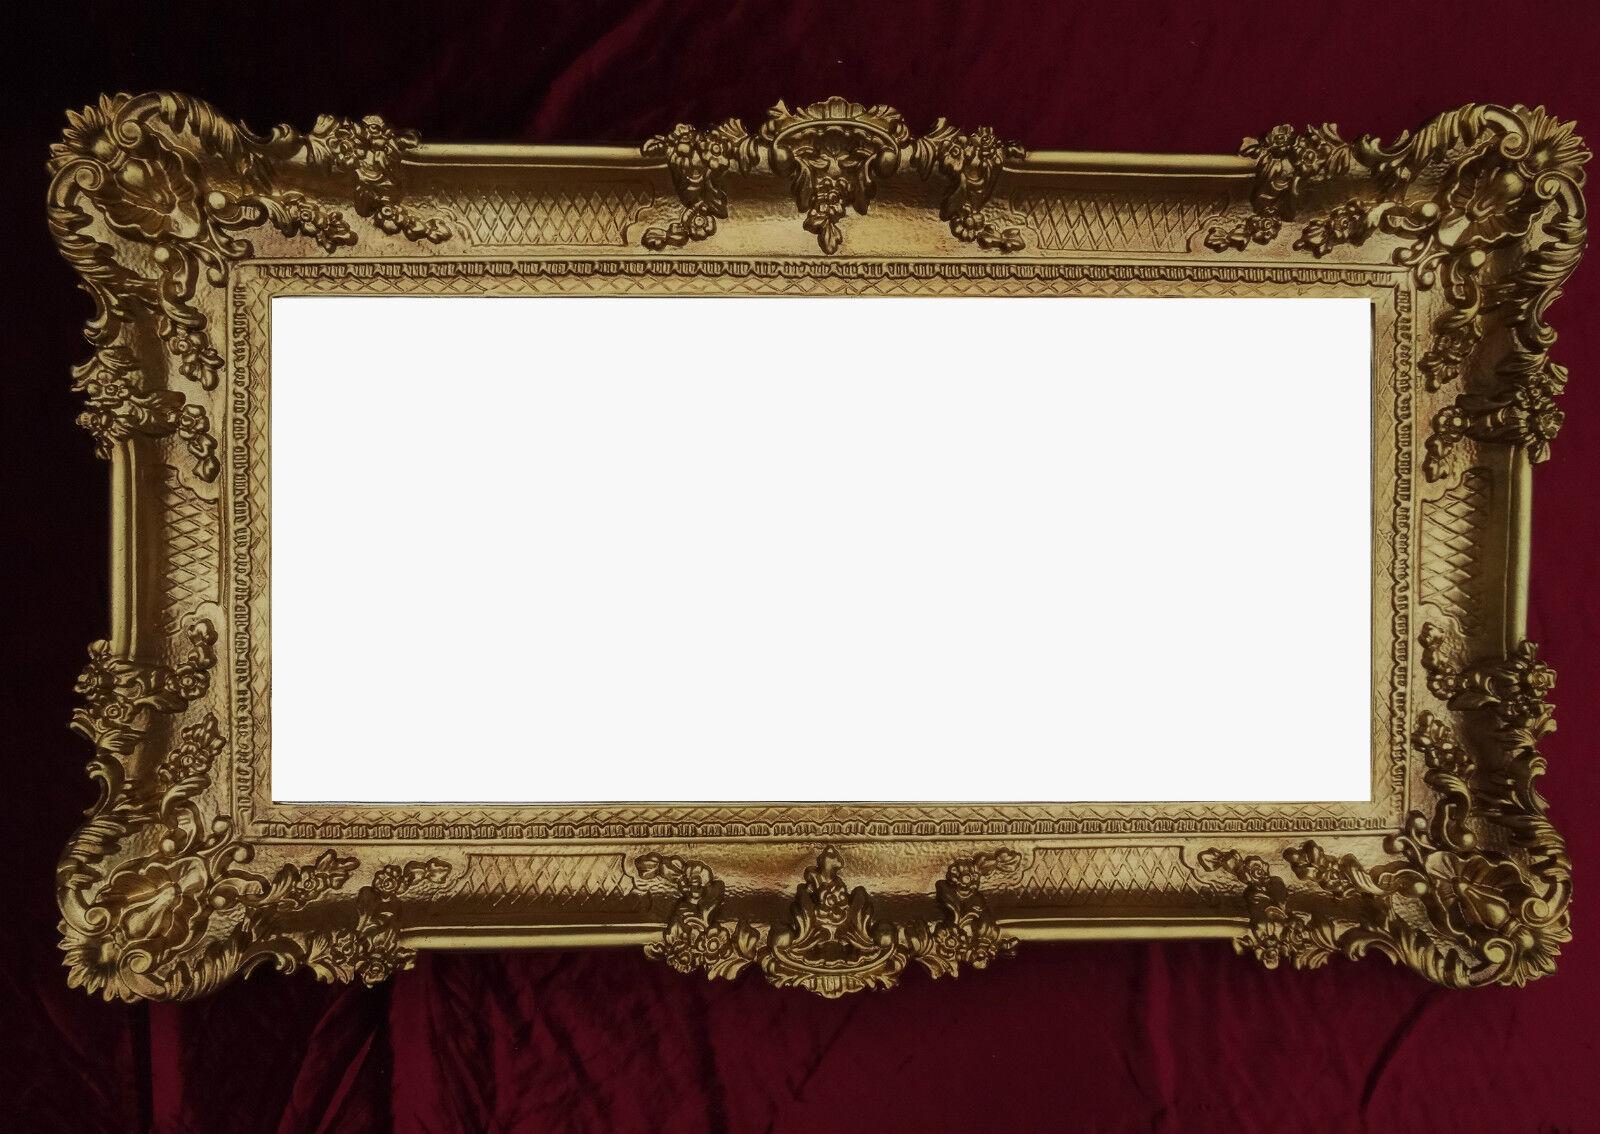 wandspiegel gold 96x57 antik spiegel barock rokoko. Black Bedroom Furniture Sets. Home Design Ideas